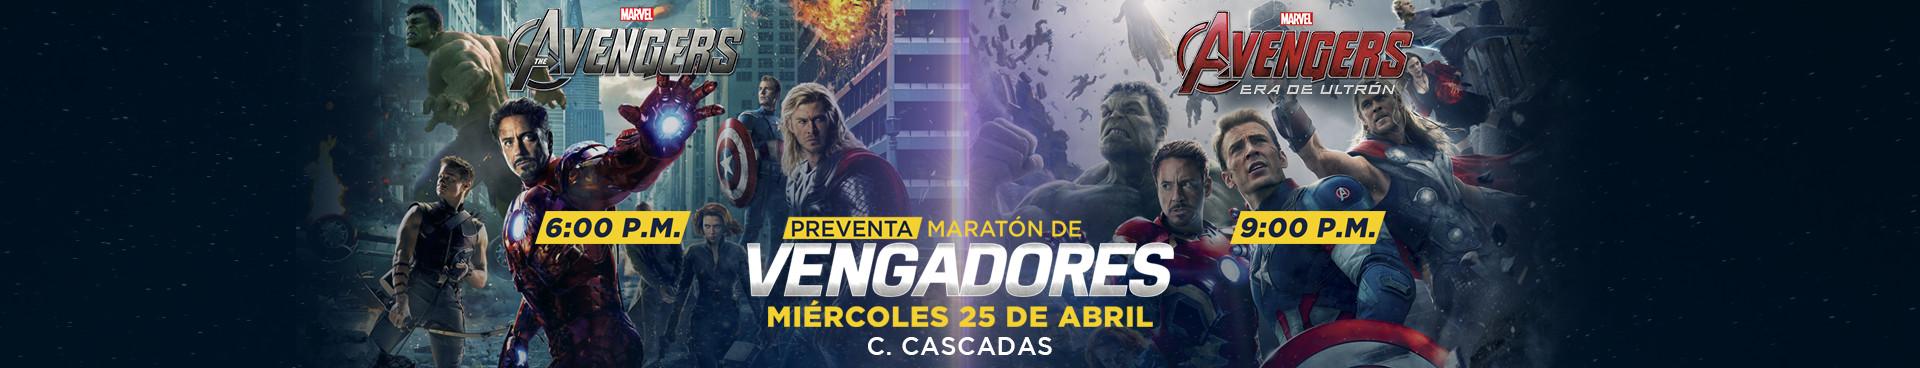 Preventa Maraton Avengers